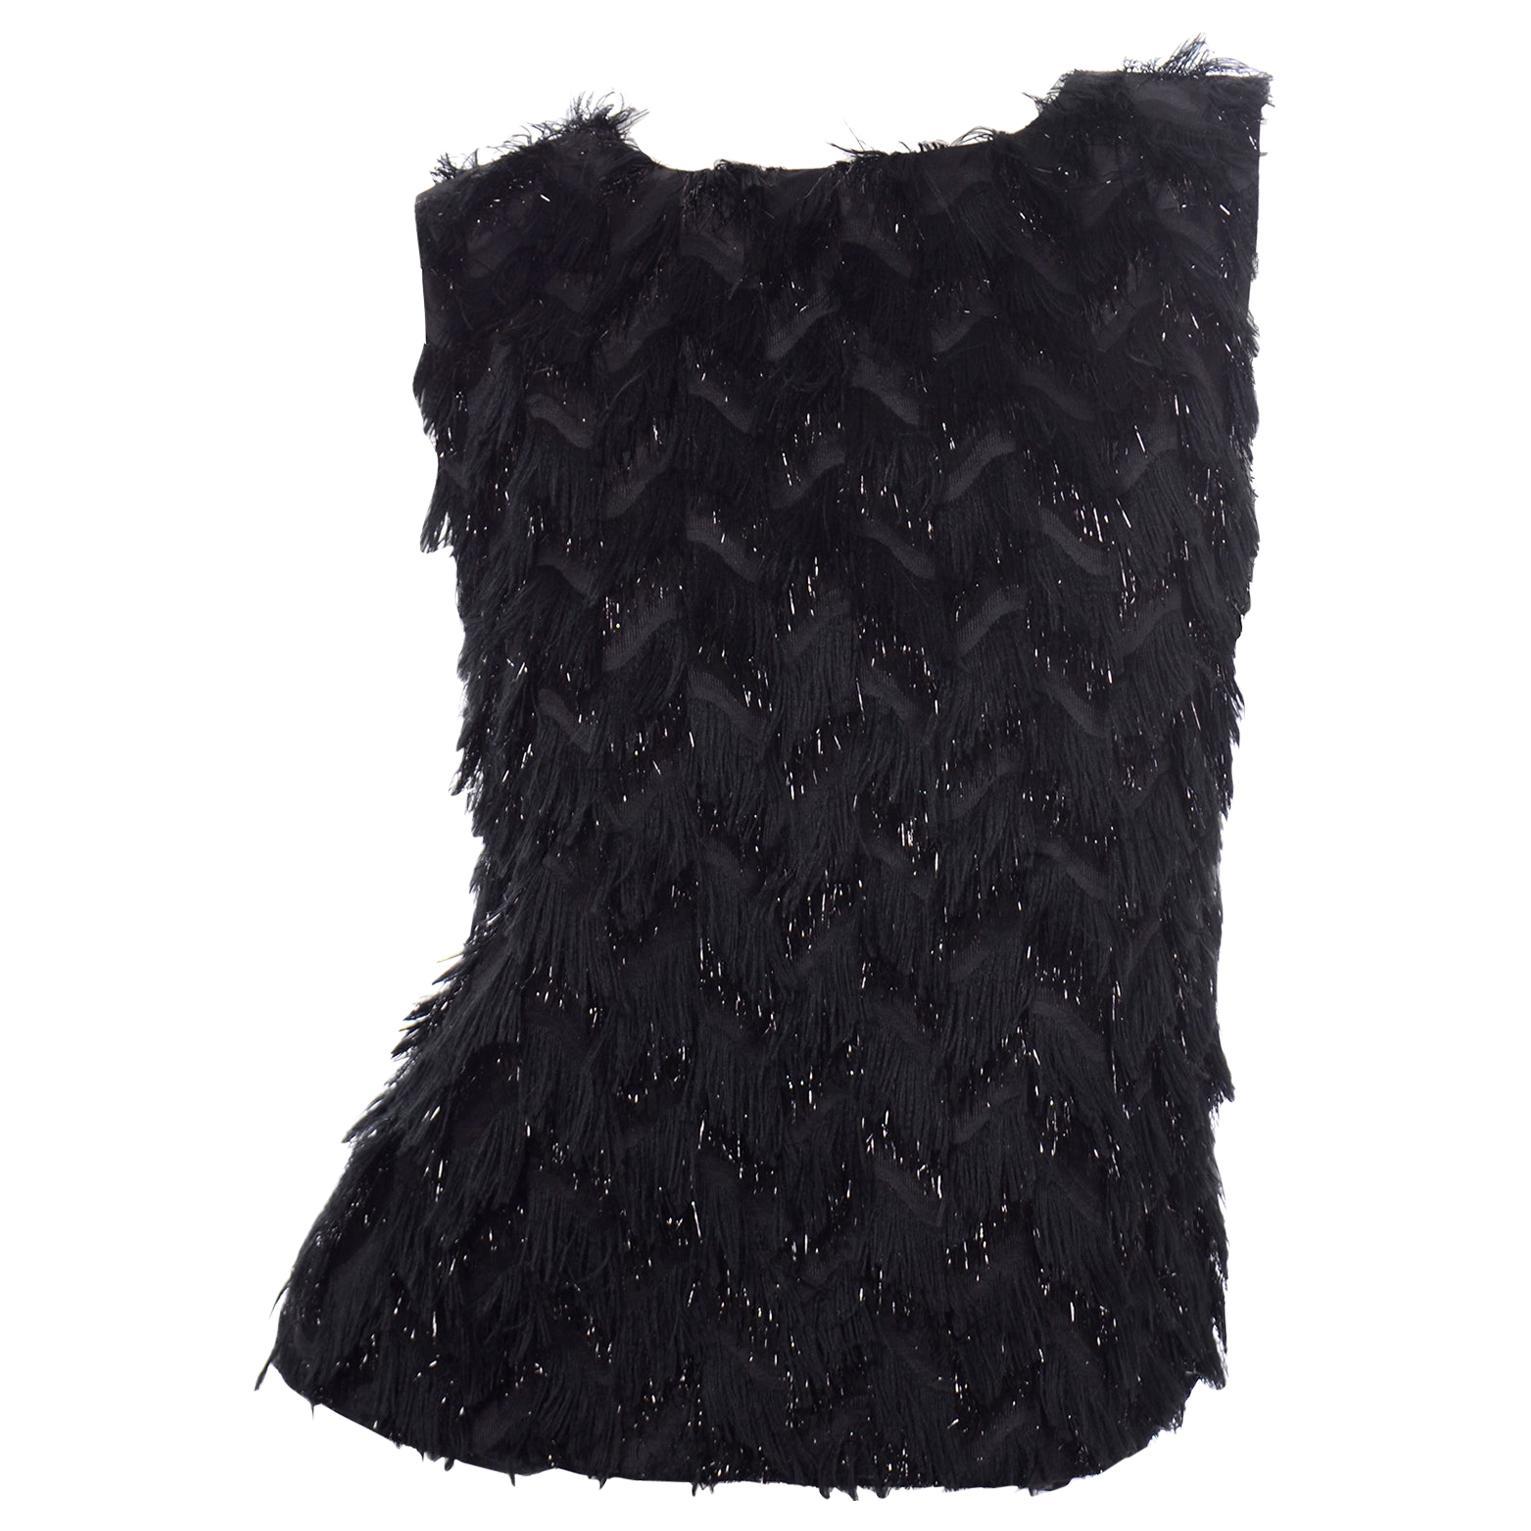 Alber Elbaz Lanvin Fall Winter 2014 Sleeveless Black Fringe Evening Top